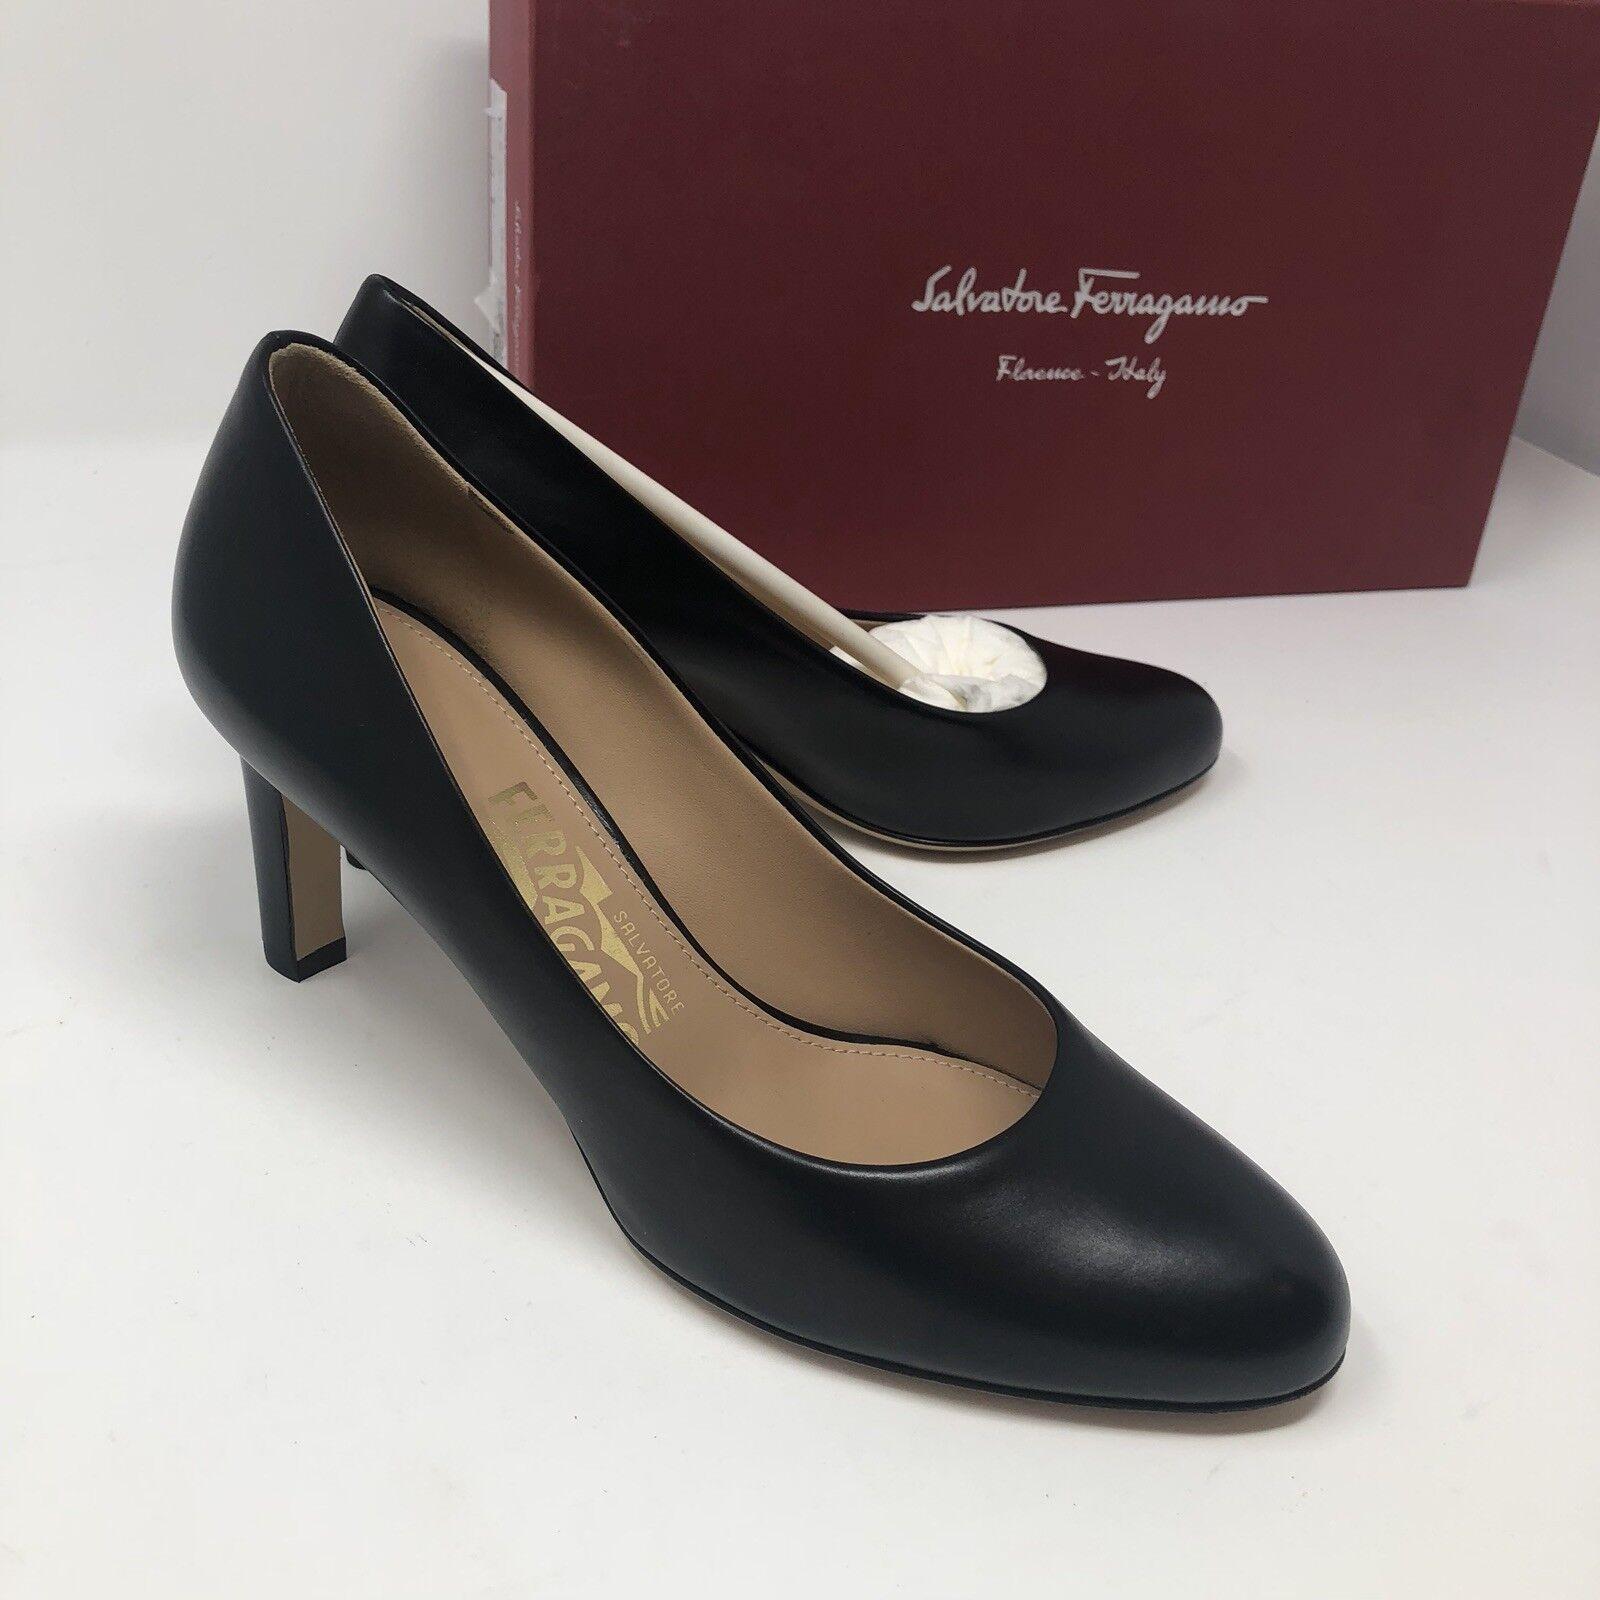 600 New Salvatore Ferragamo Womens Black Heels Ladies shoes Size 5.5 C US